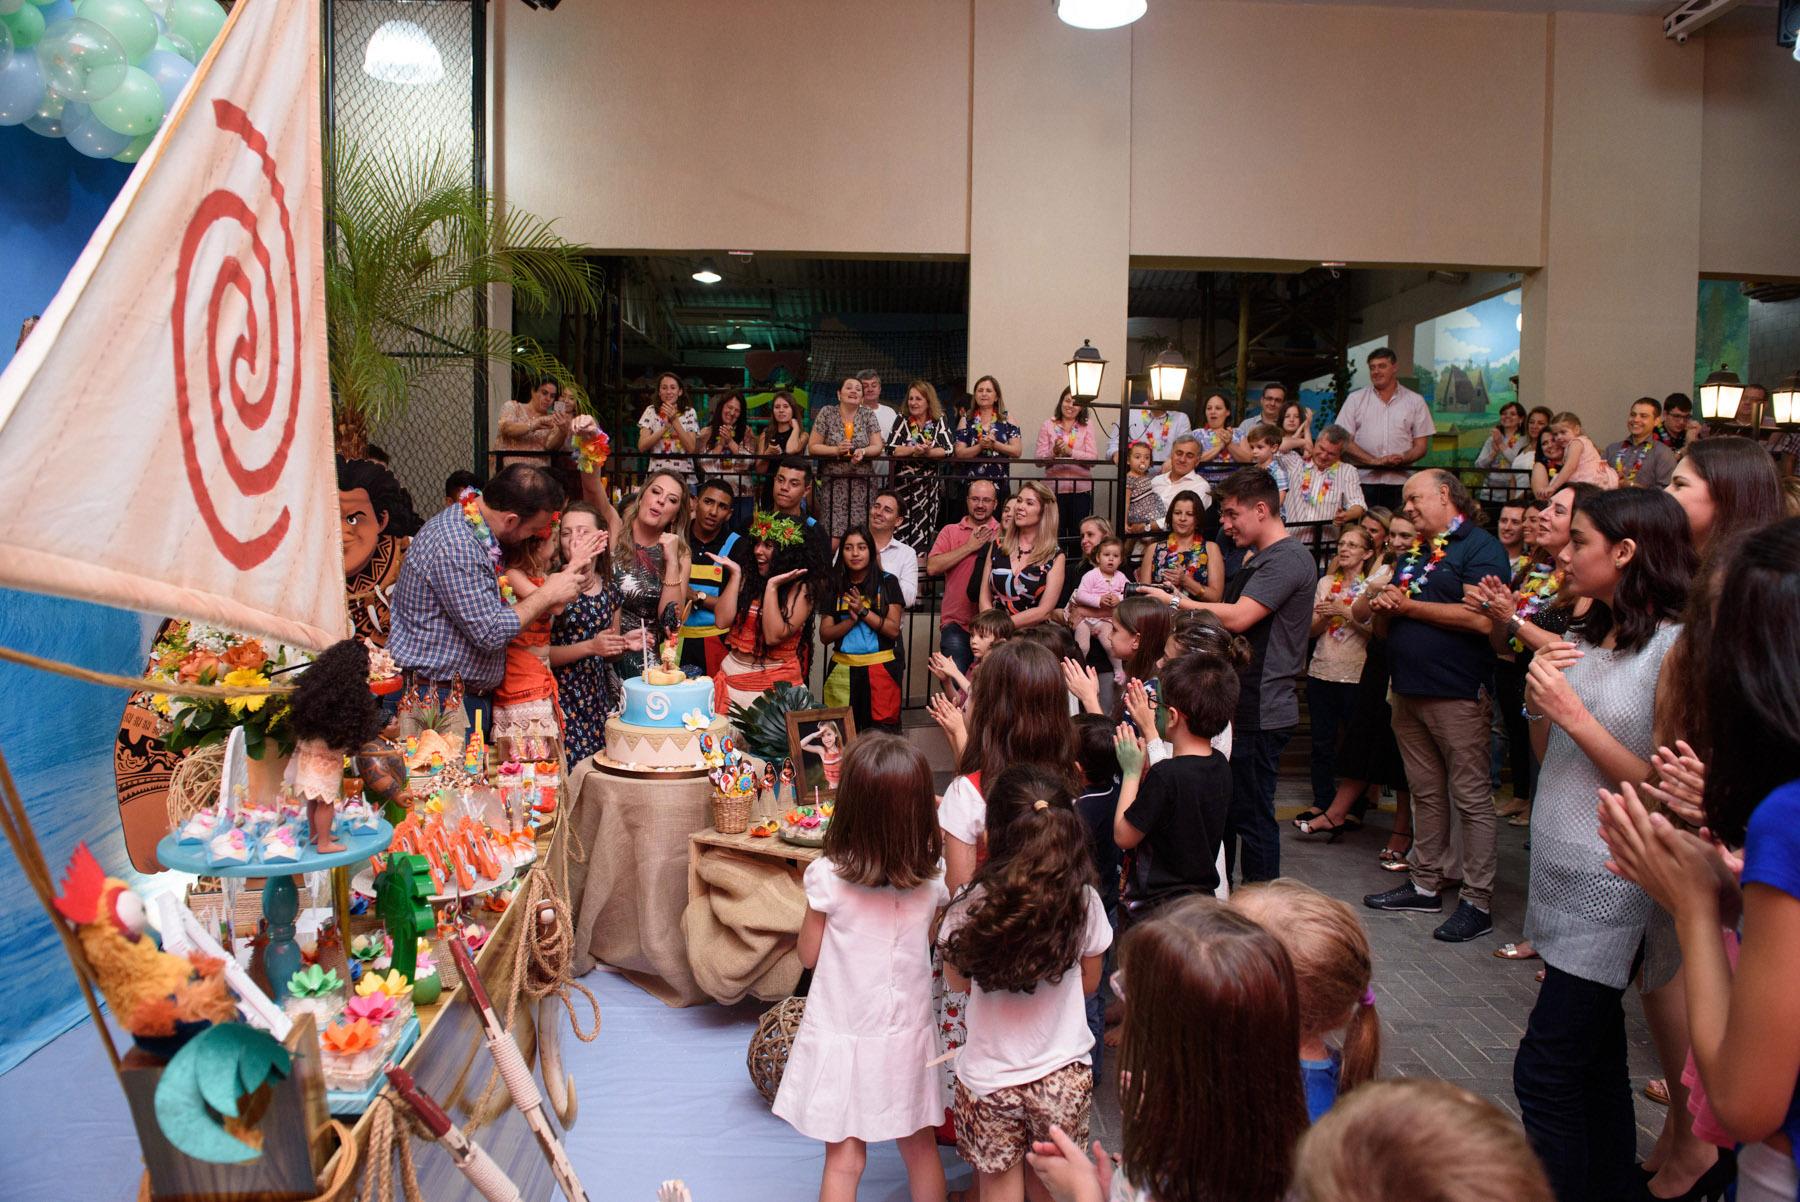 015_fotografia-aniversario-infantil-moana-curitiba-buffet-brigadeiro-guswanderley.jpg